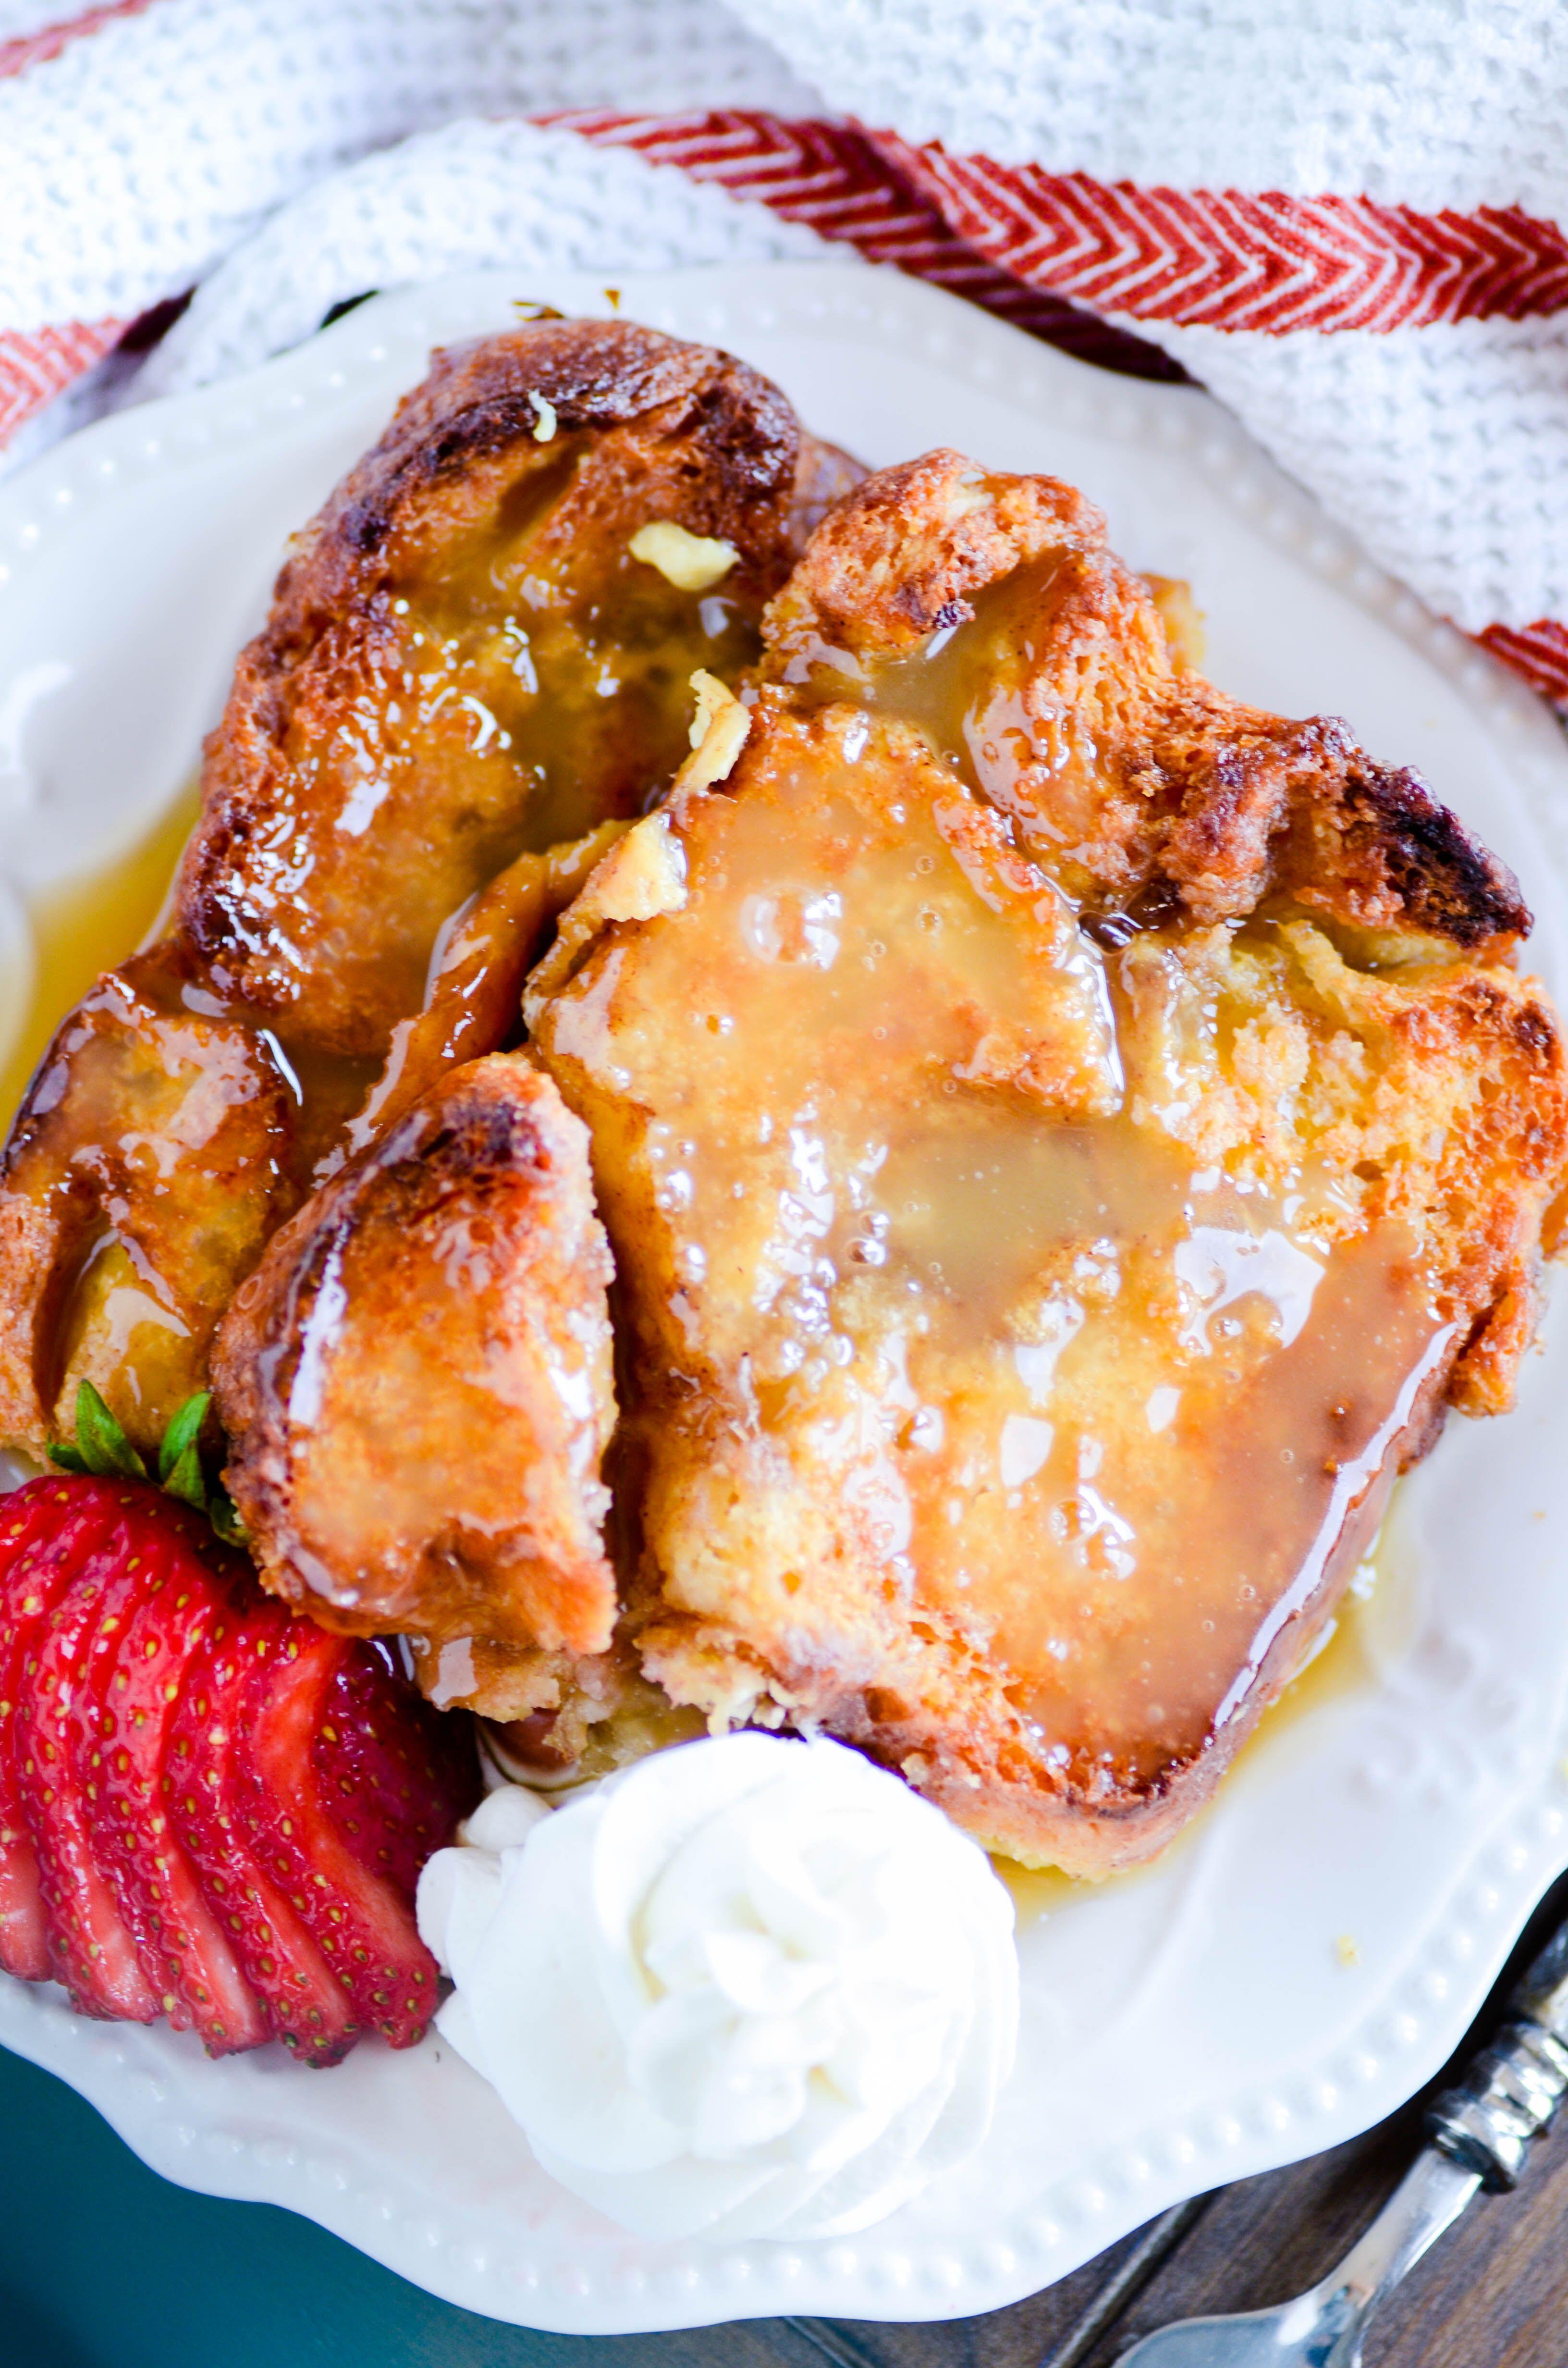 Monkey Bread French Toast Recipe In 2020 Monkey Bread Recipes Toast Recipes